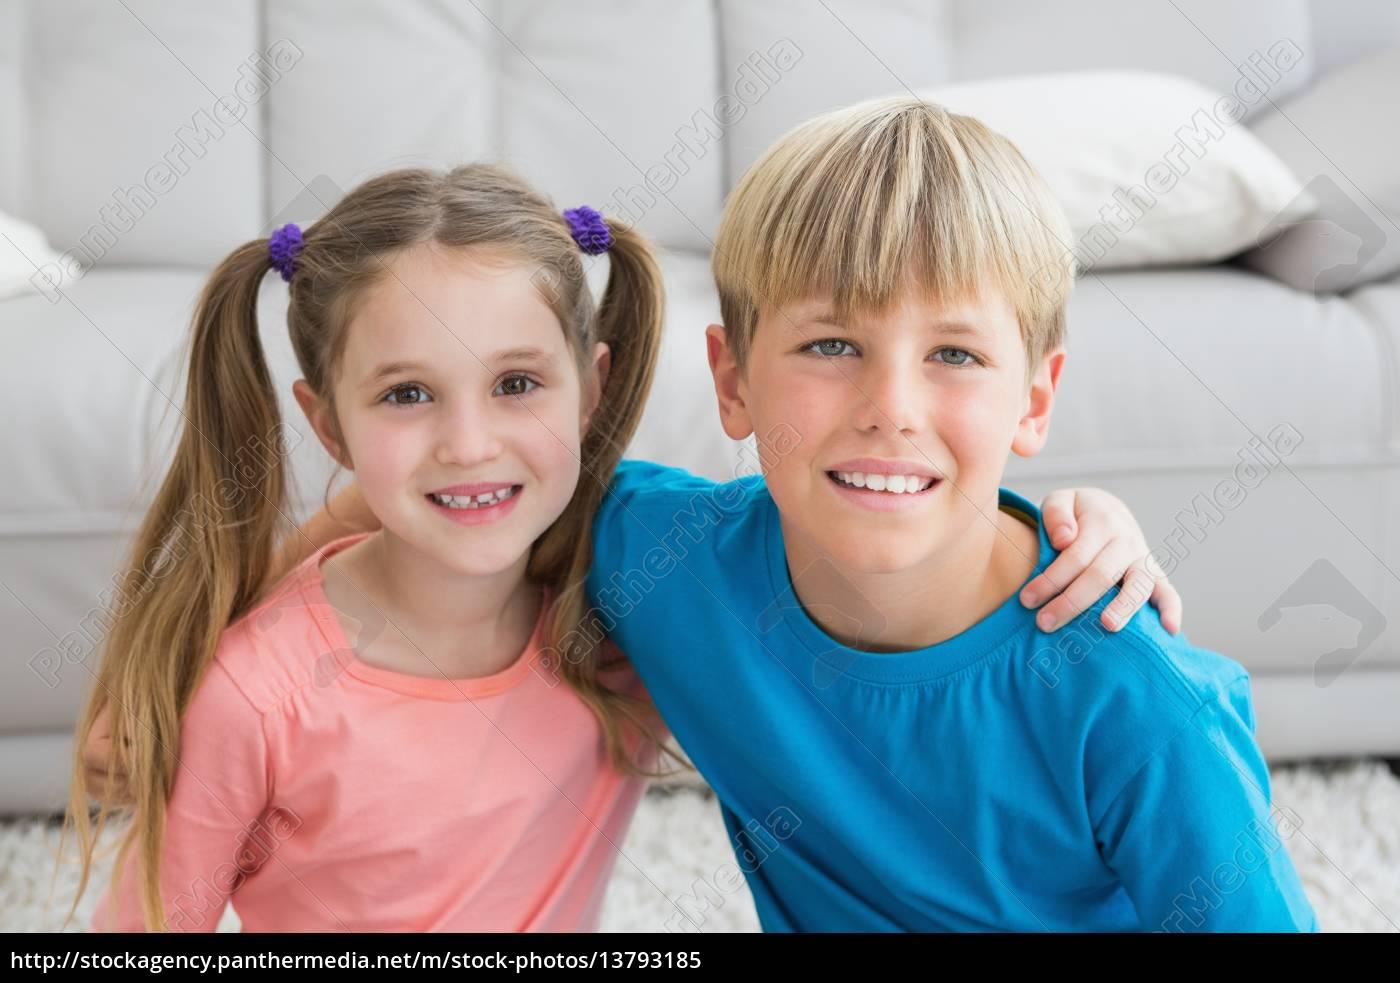 happy, siblings, smiling, at, camera, together - 13793185